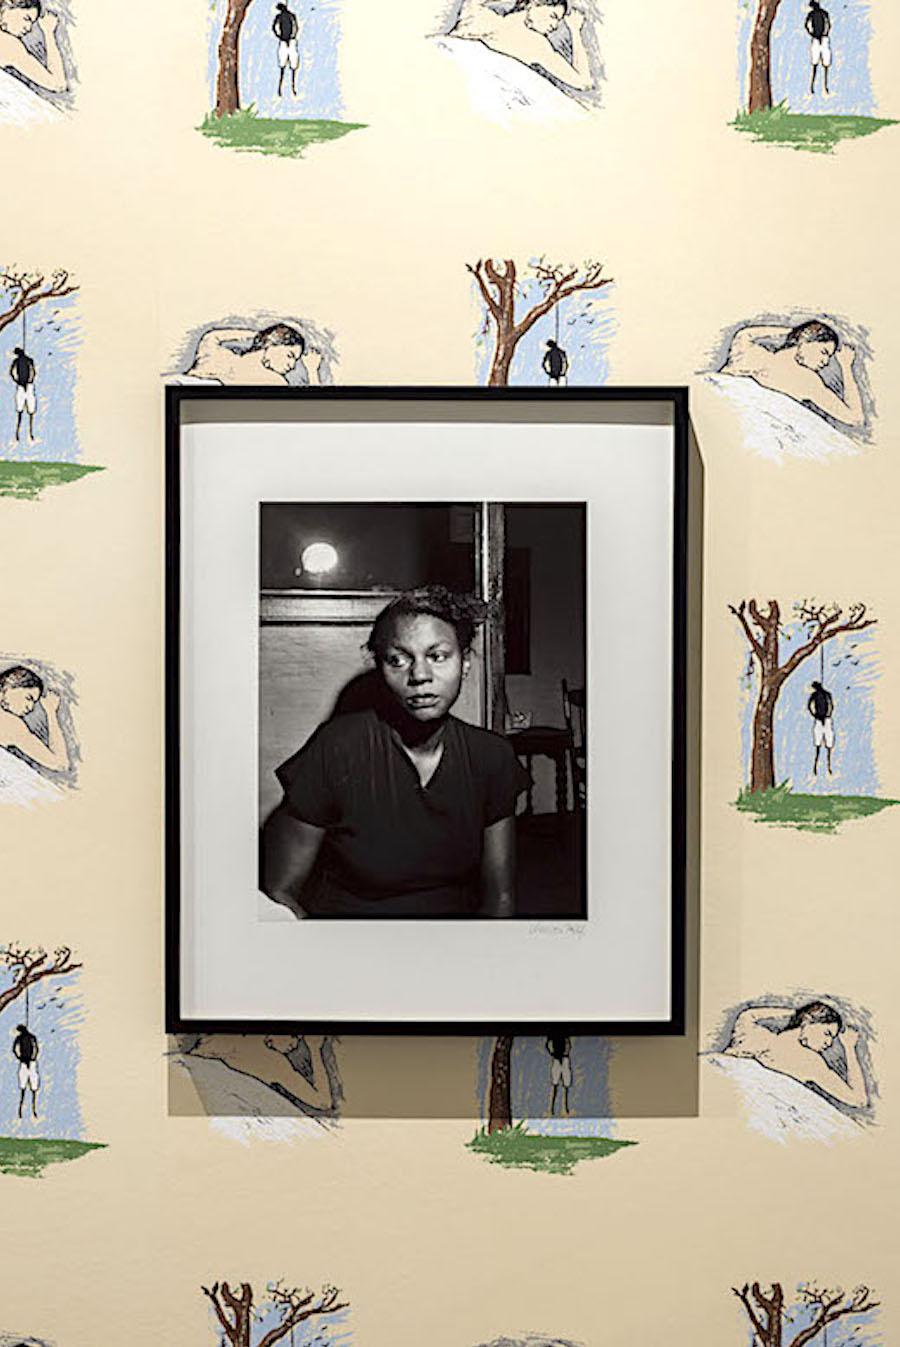 African American Painter, African American Artists, African American Art, African American News, KOLUMN Magazine, KOLUMN